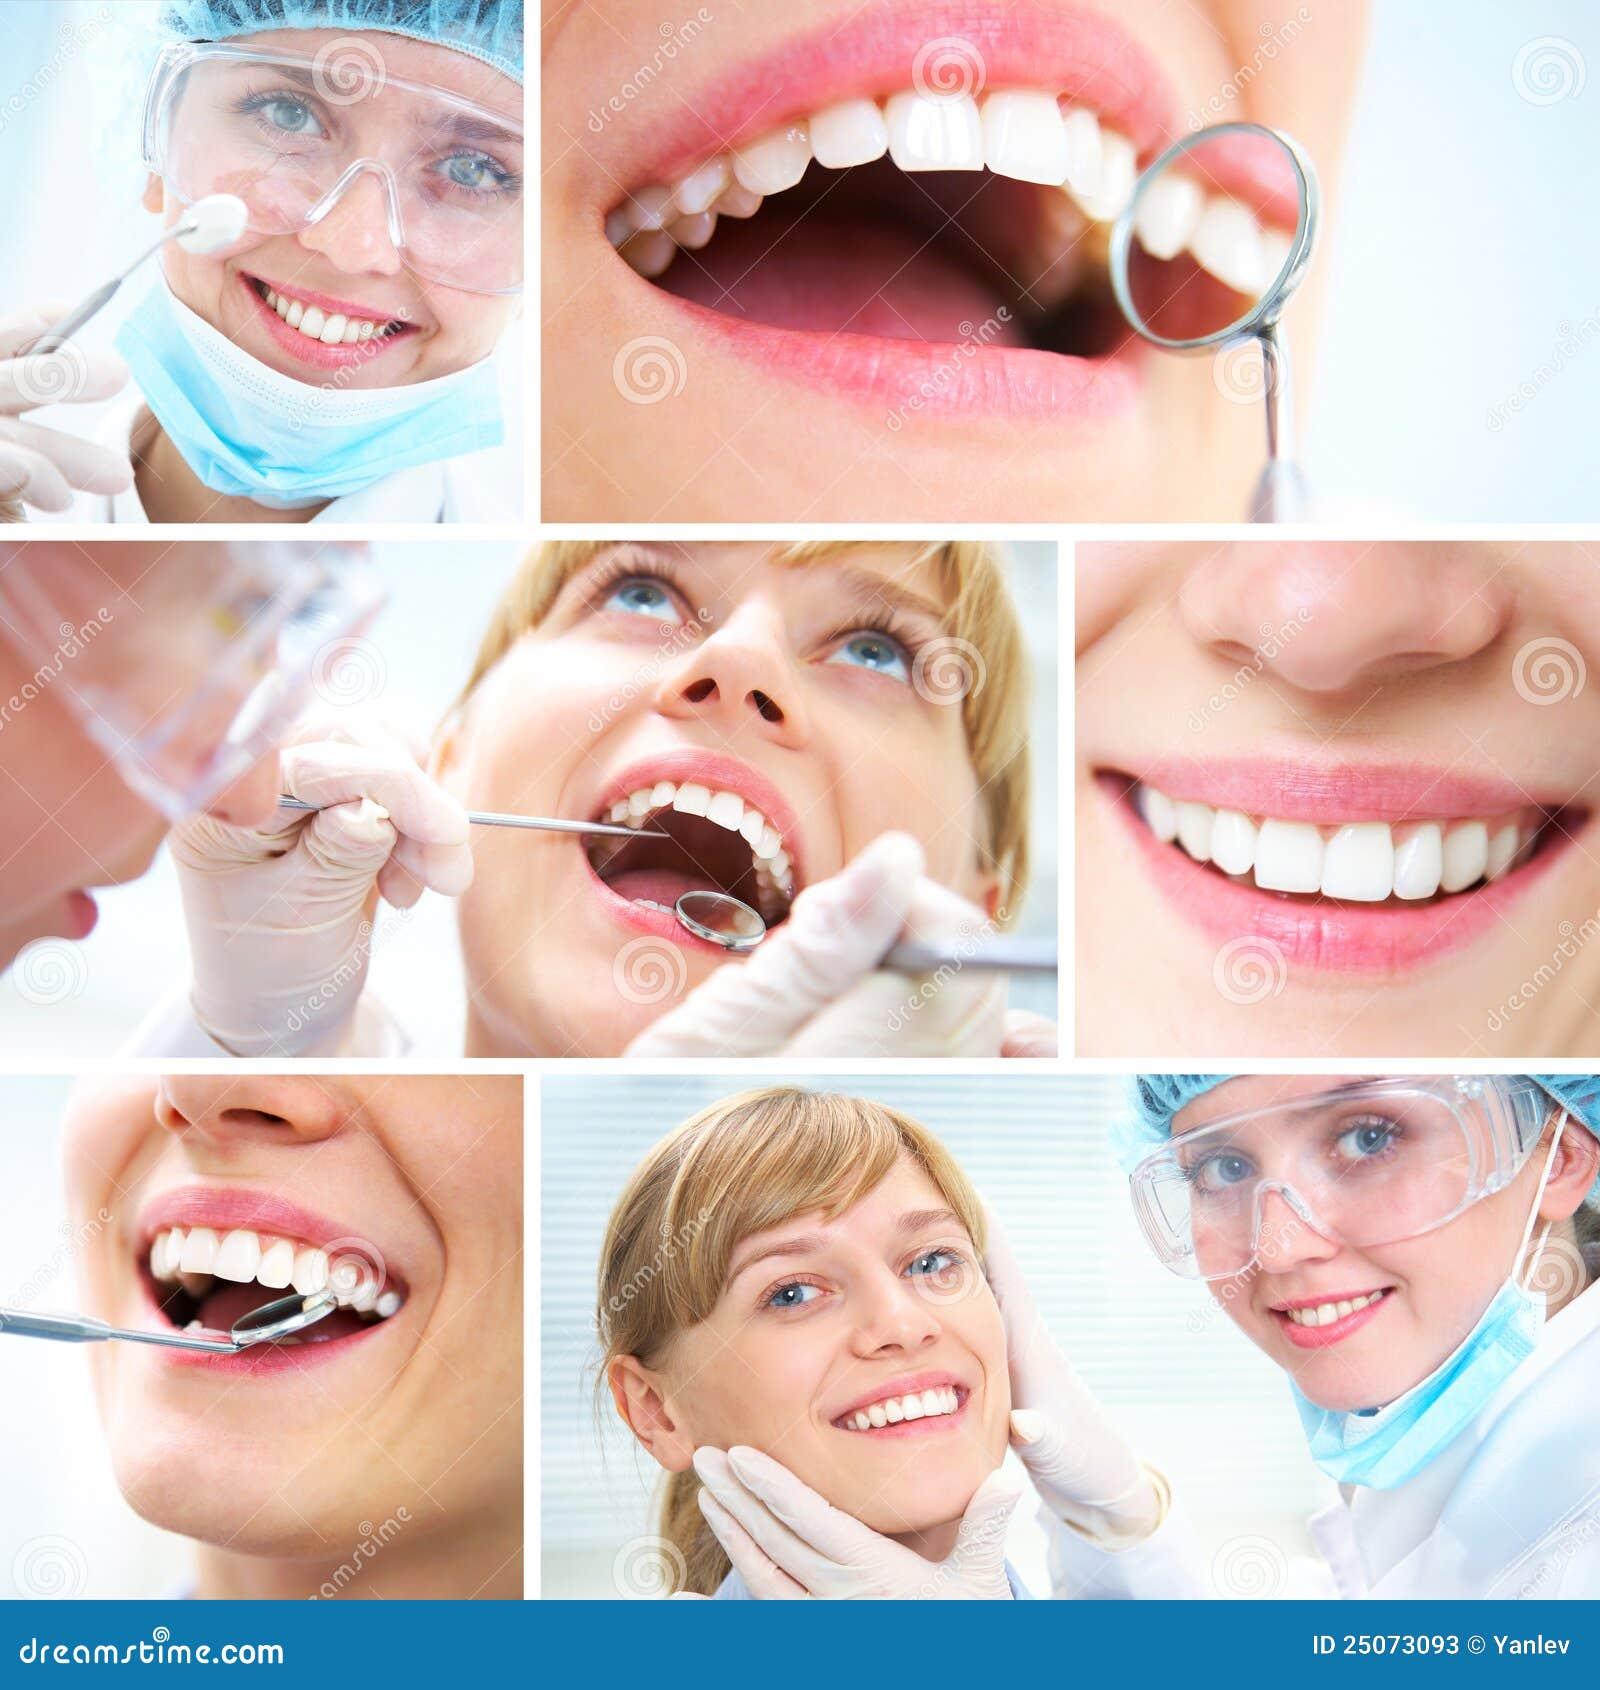 Healthy Teeth And Dental Doctor Stock Photos - Image: 25073093